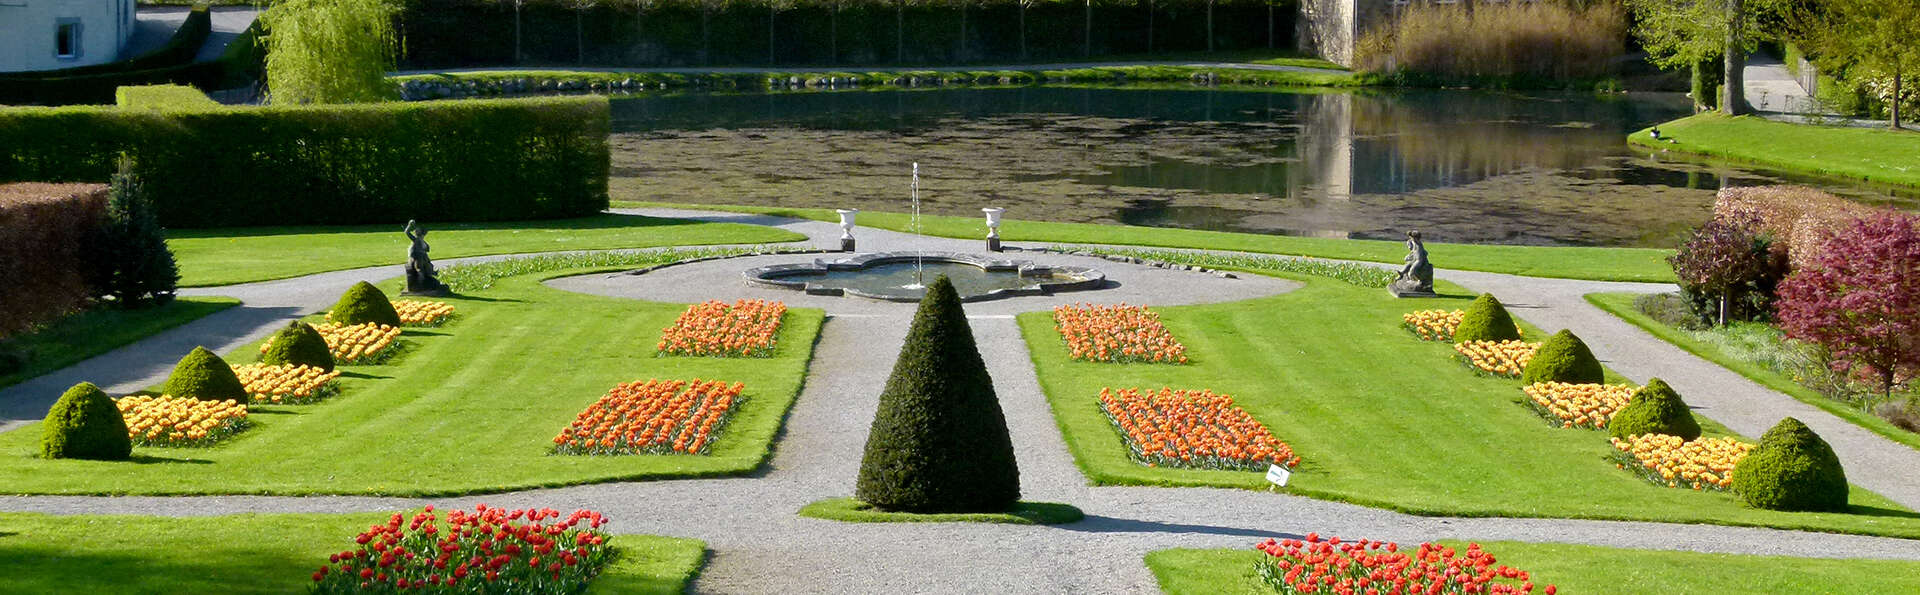 Les Jardins de la Molignée - EDIT_NEW_Destination2.jpg